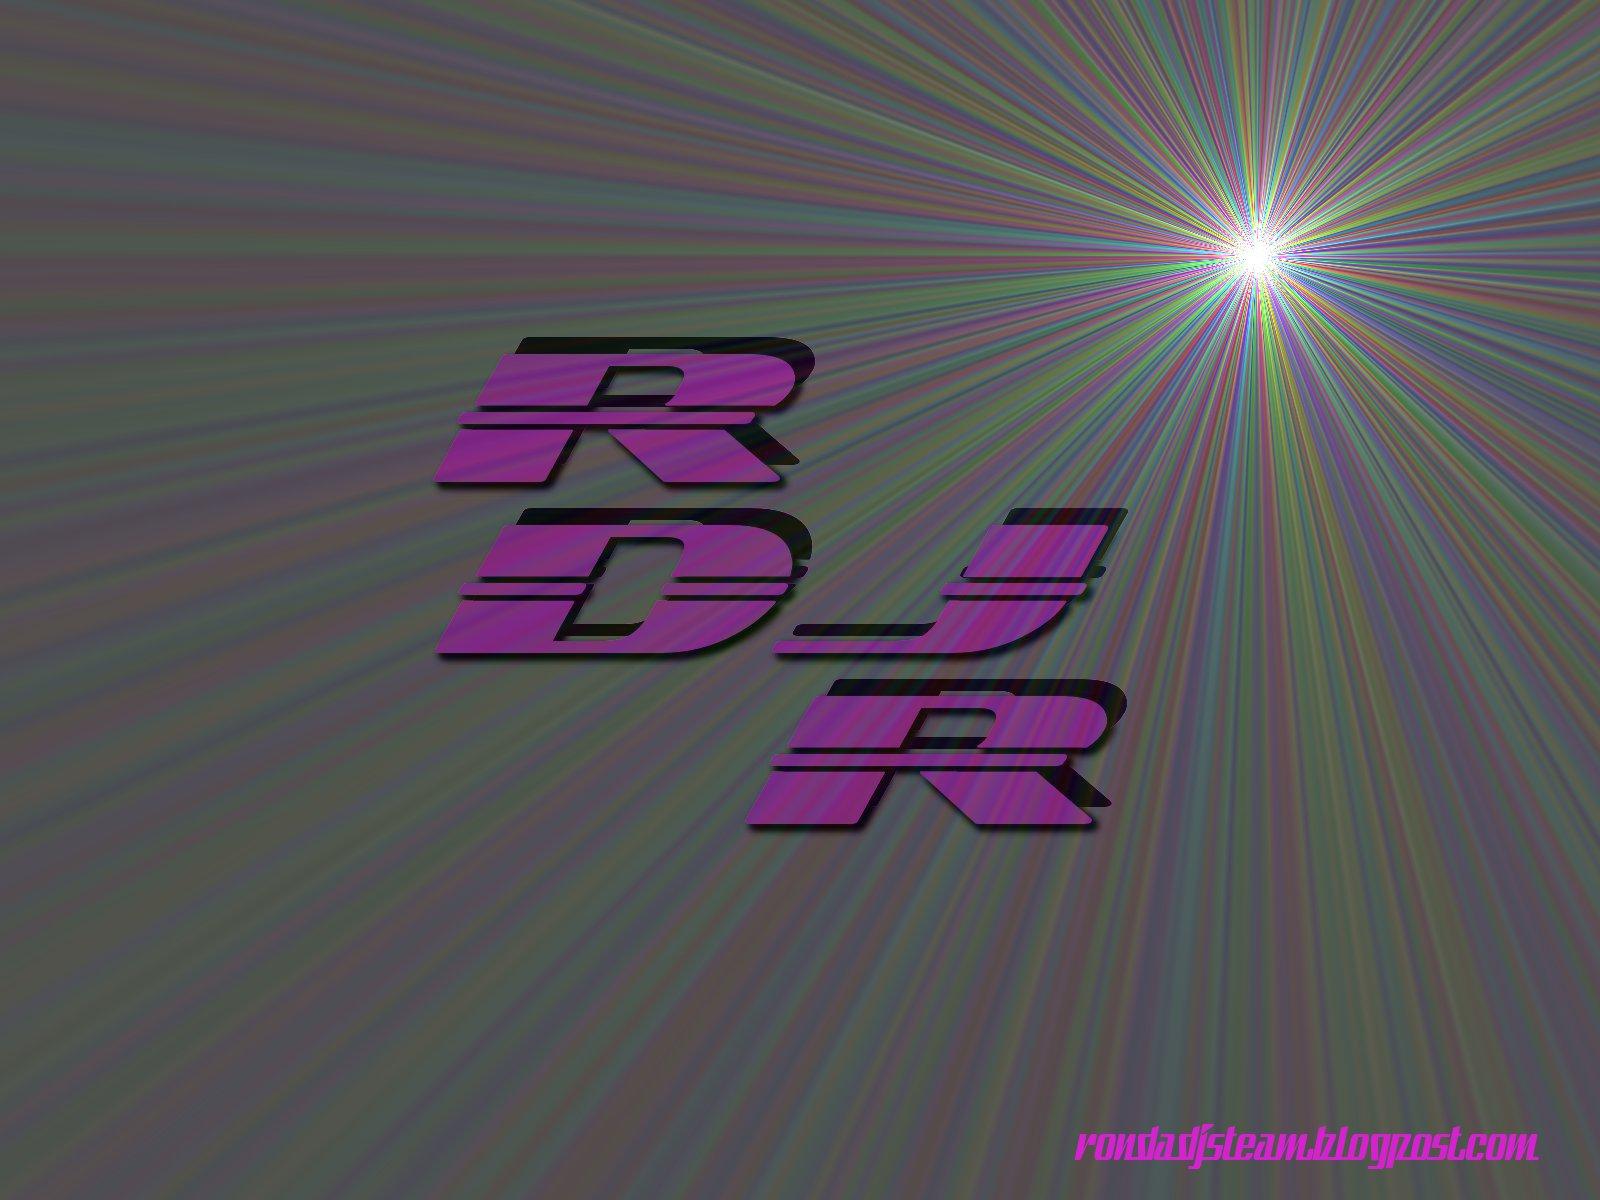 Rdjr8g ya tenemos nuevo logo malvernweather Gallery